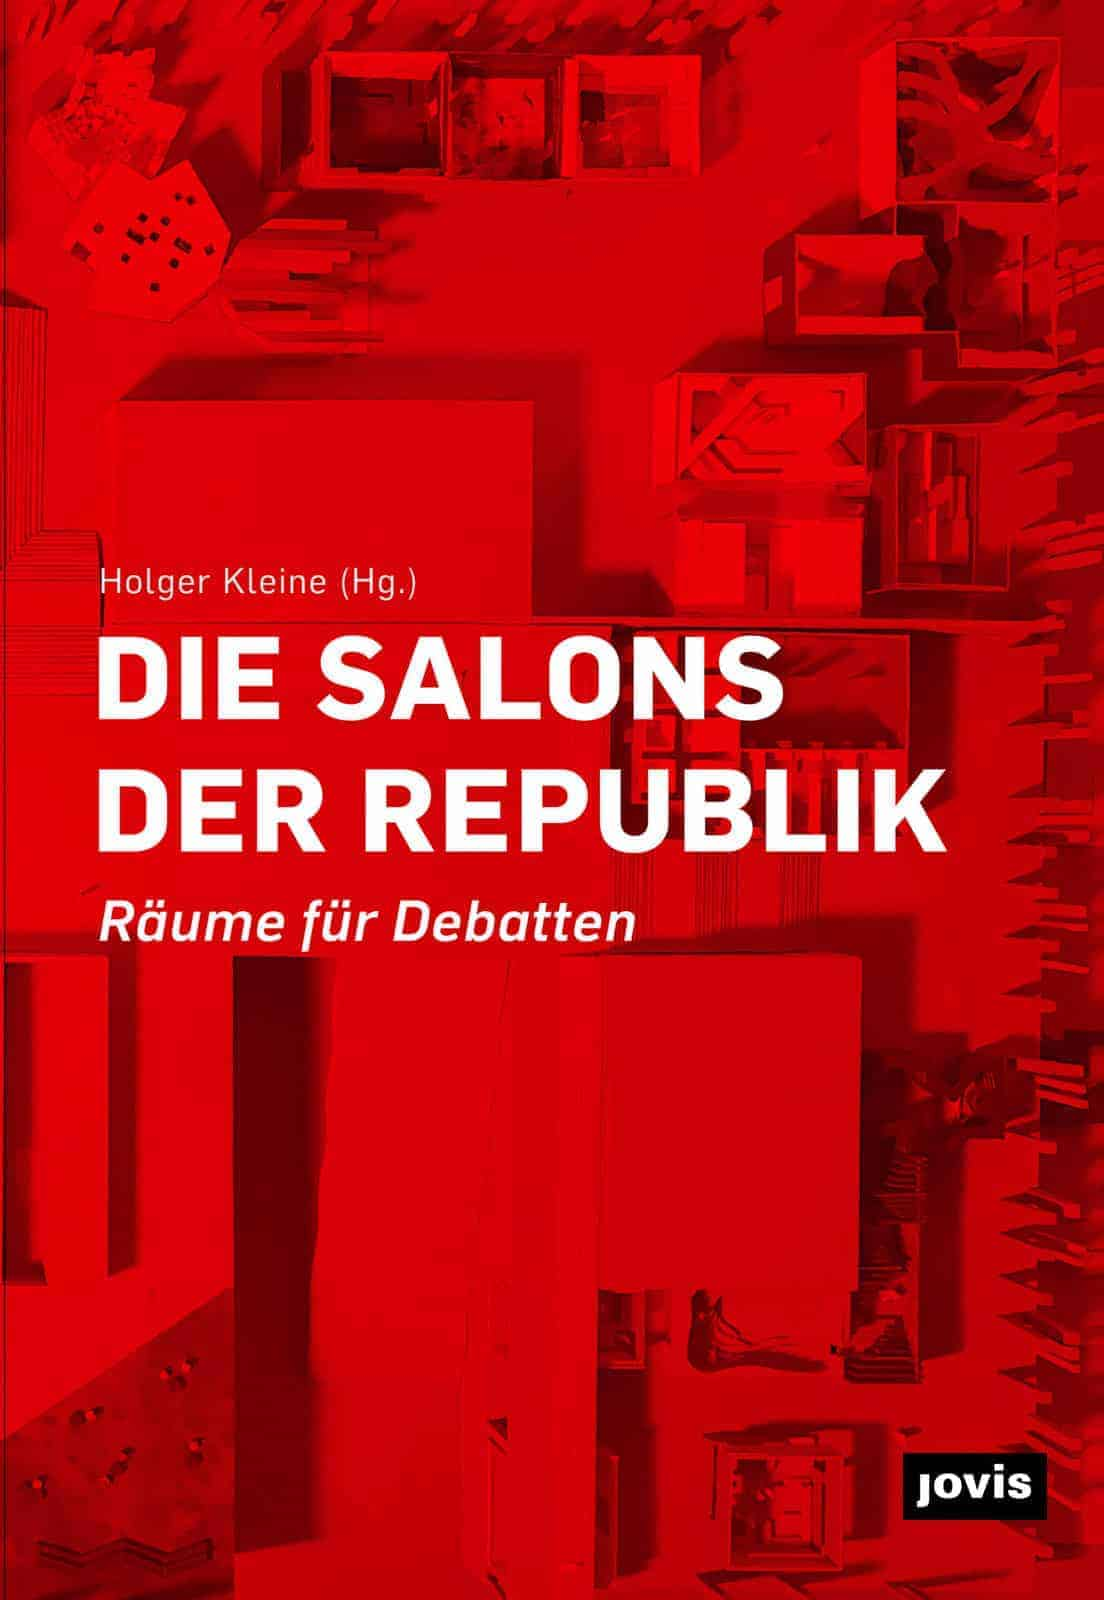 Salons der Republik / @ jovis Verlag